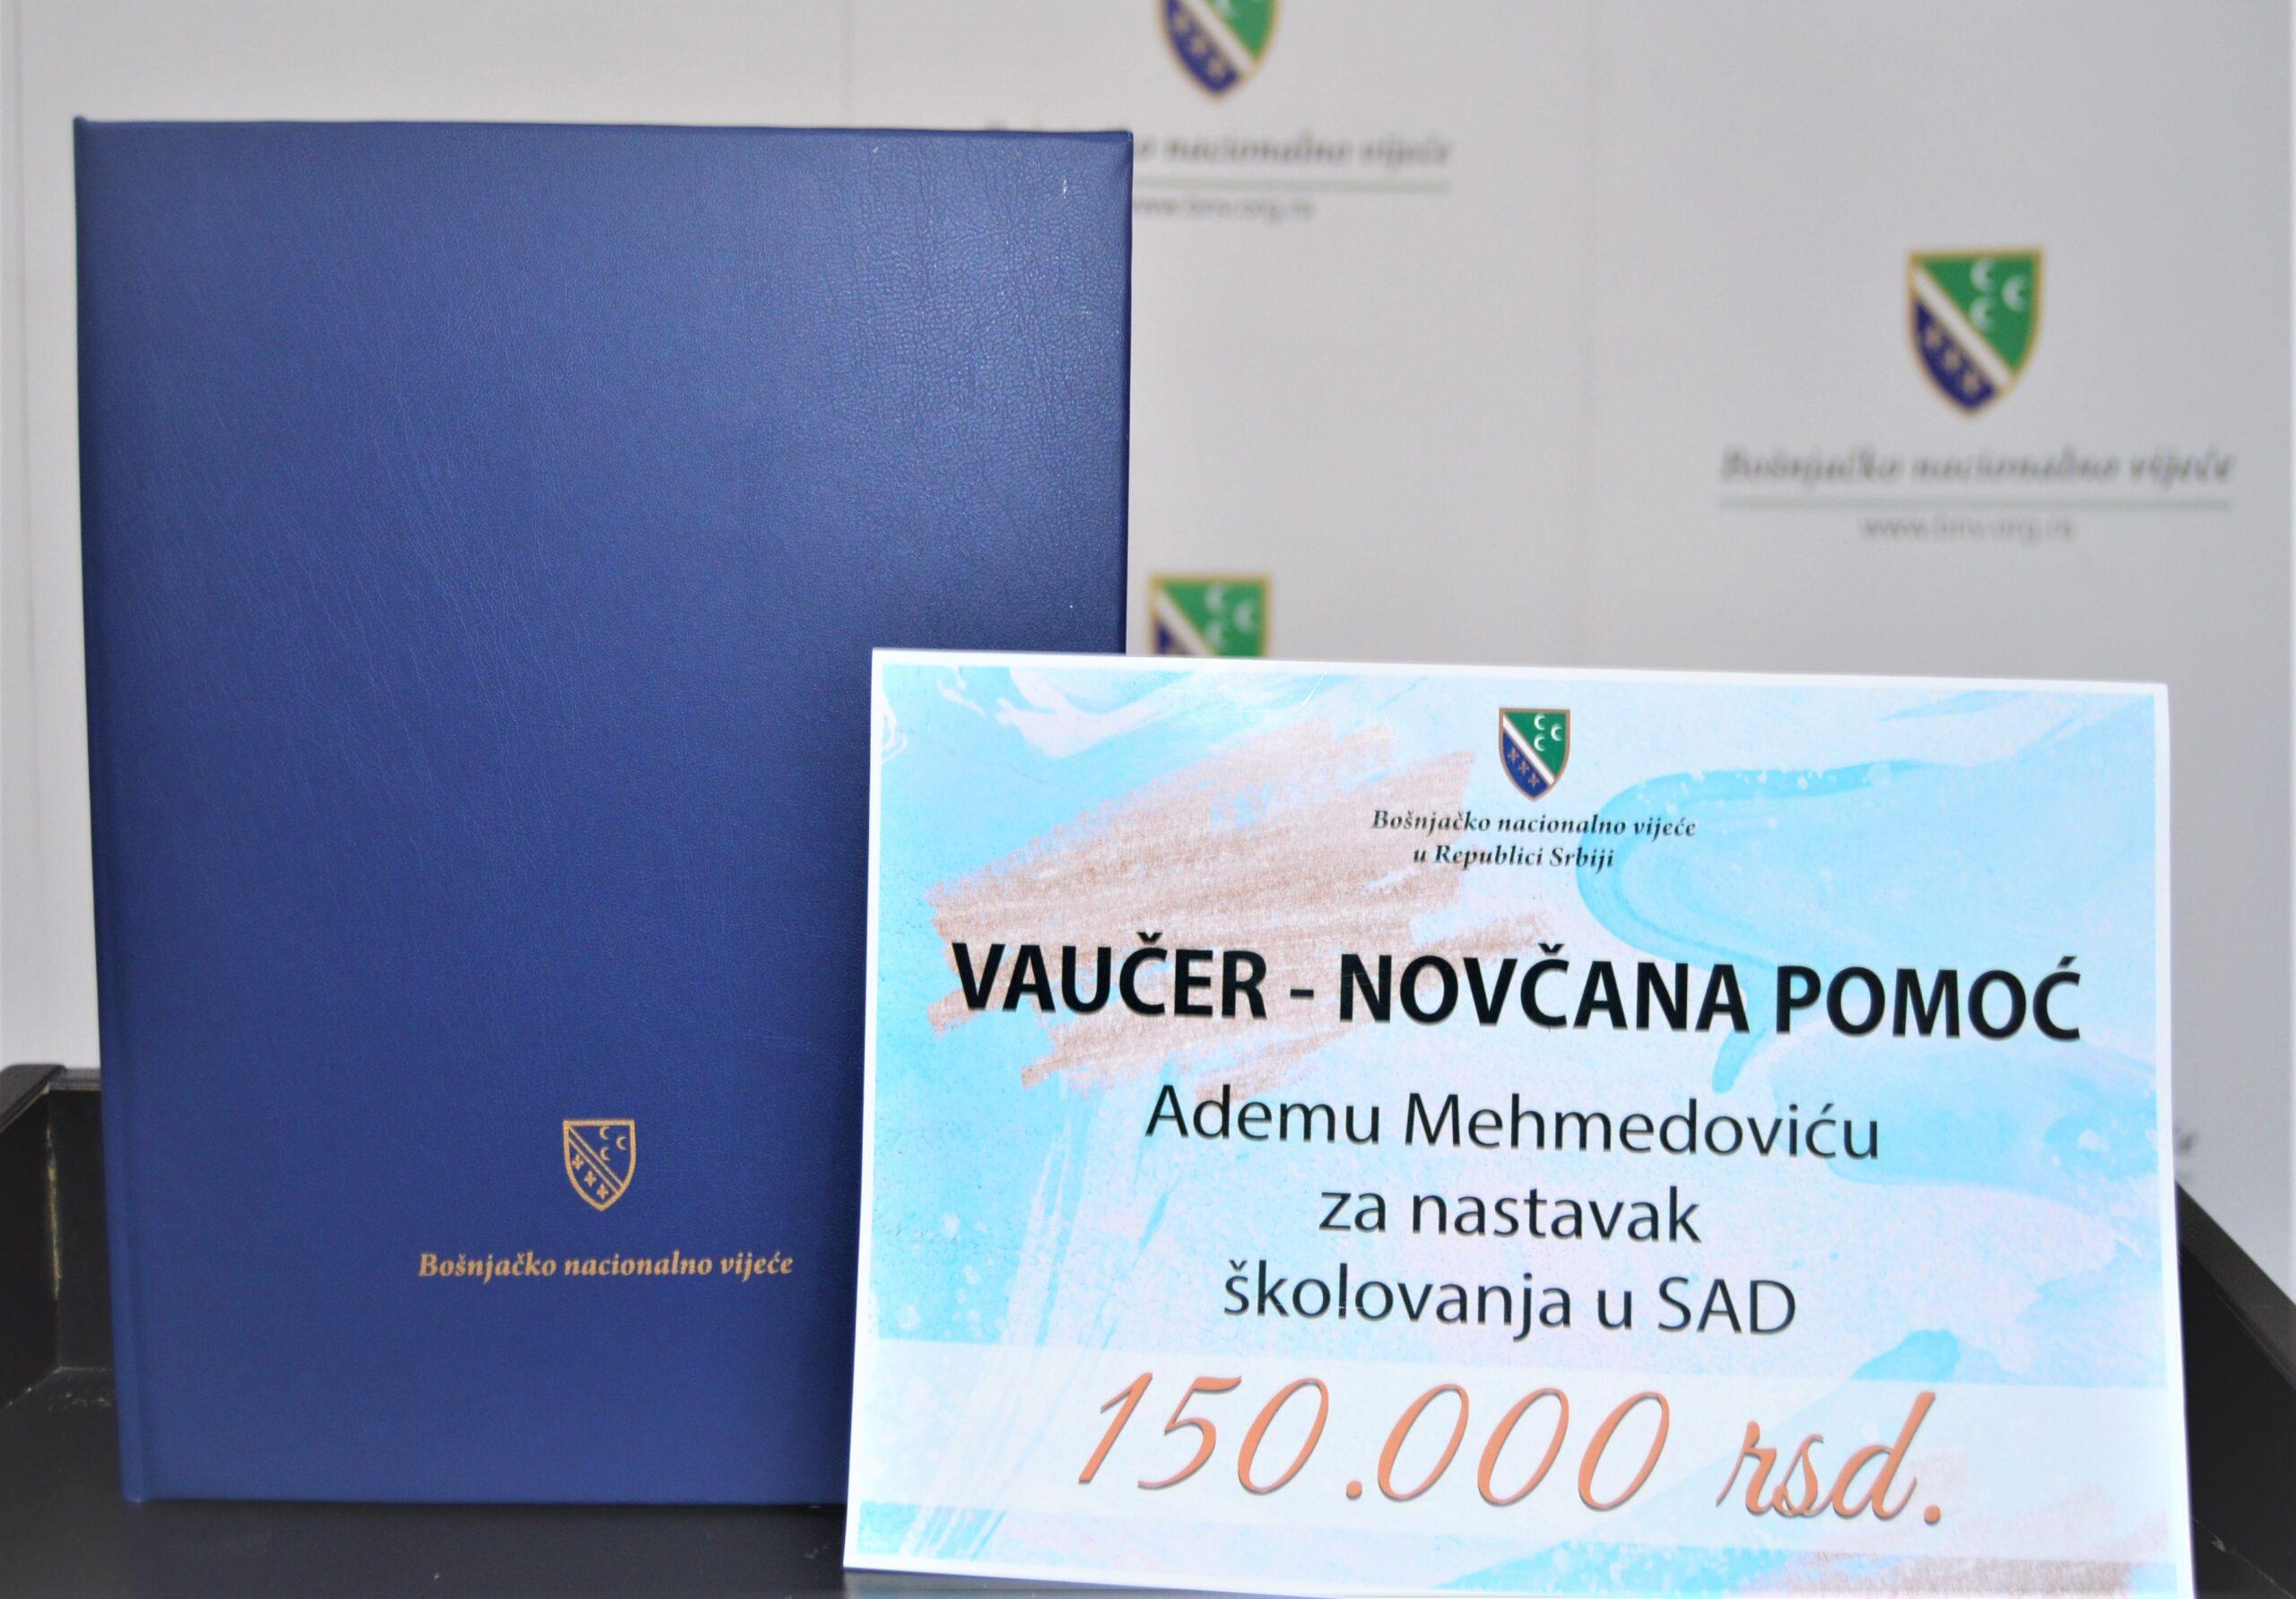 -bnv-donirao-150.000-dinara-ademu-mehmedovicu